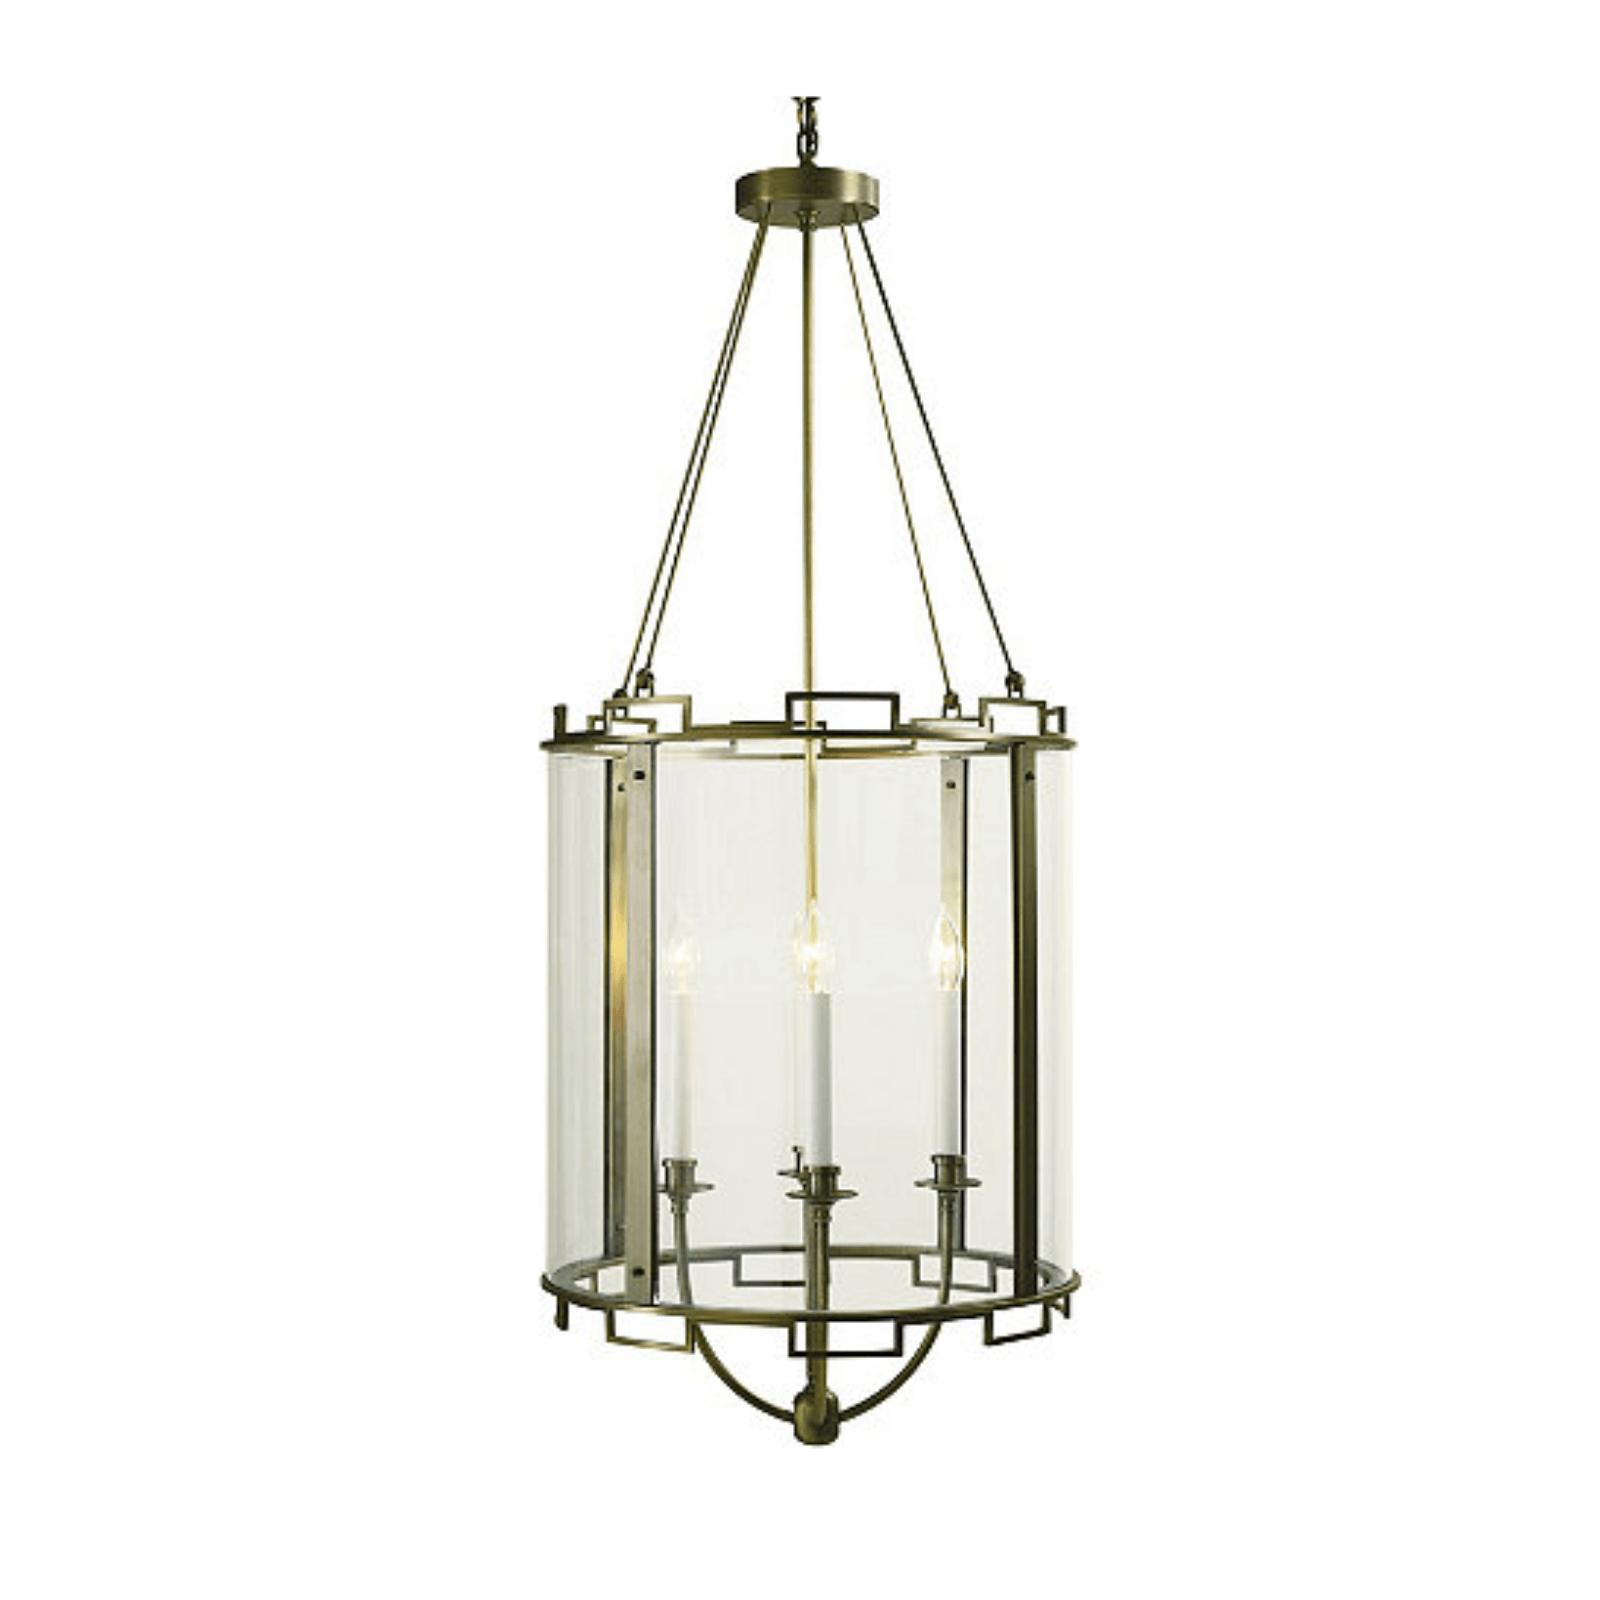 Two Design Lovers Baker Georgian Lantern